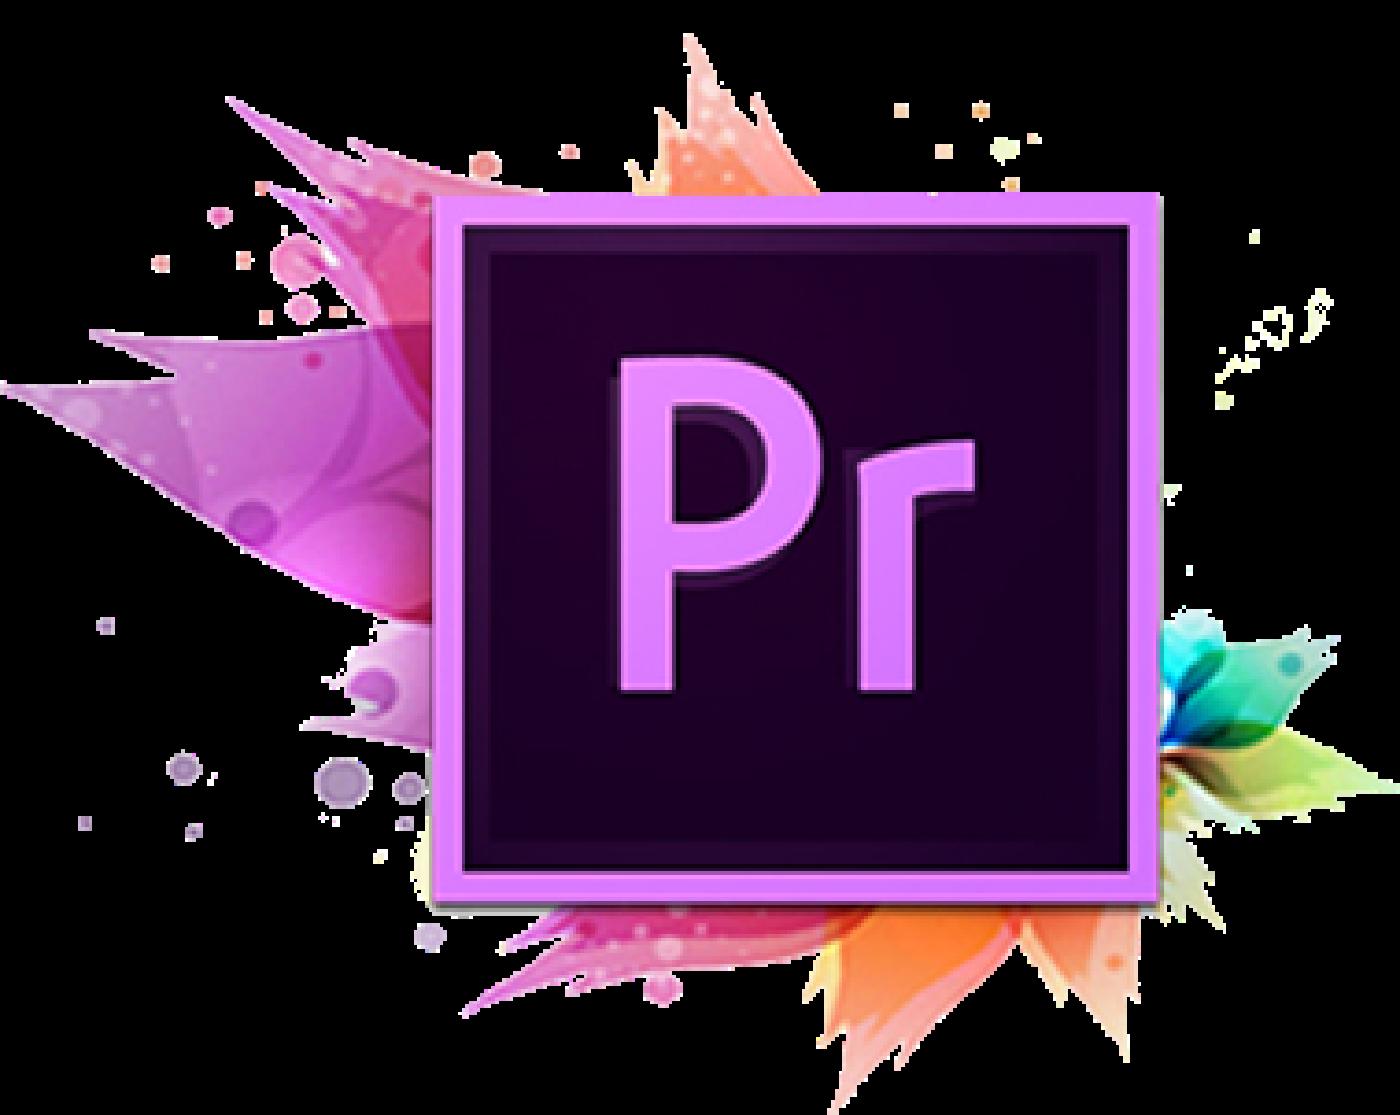 adobe premiere pro logiciel mone video